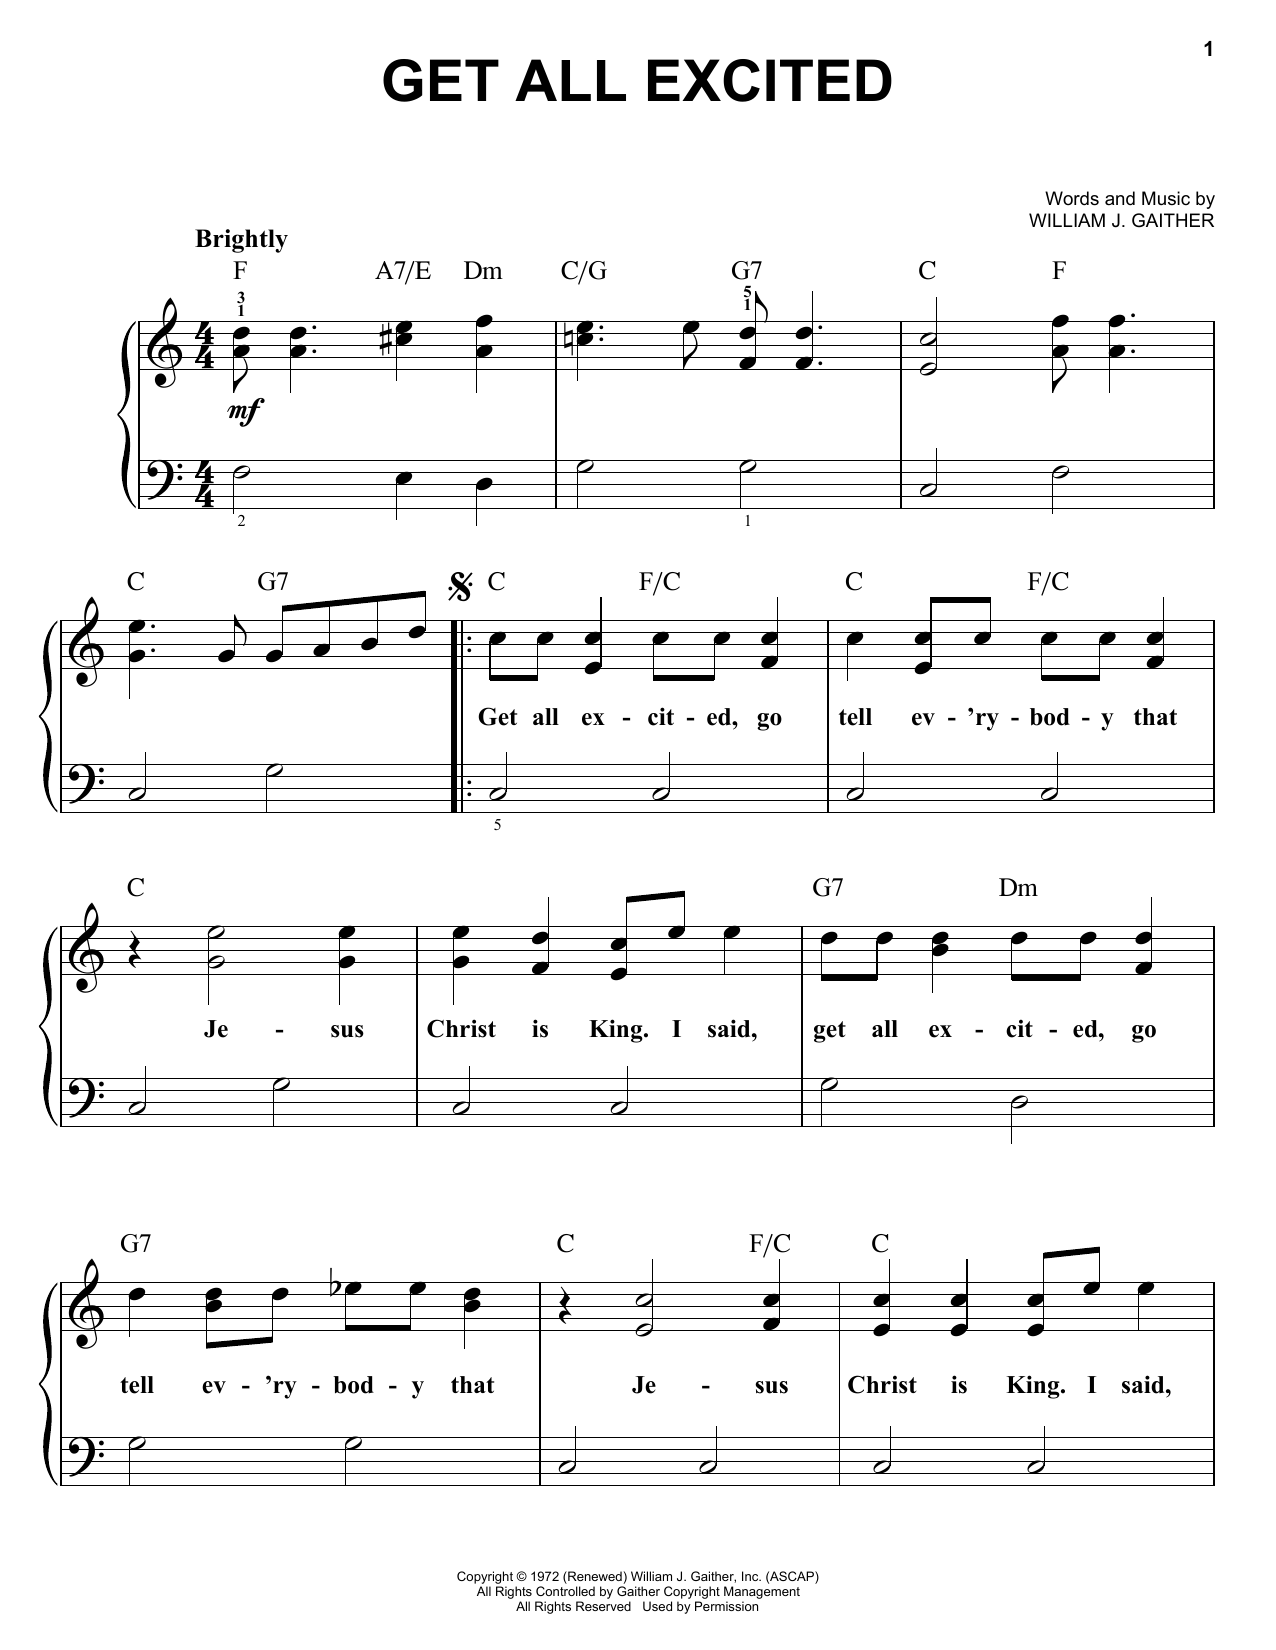 Hymn  Because He Lives Chords  GUITAR TABS amp CHORDS  AZ